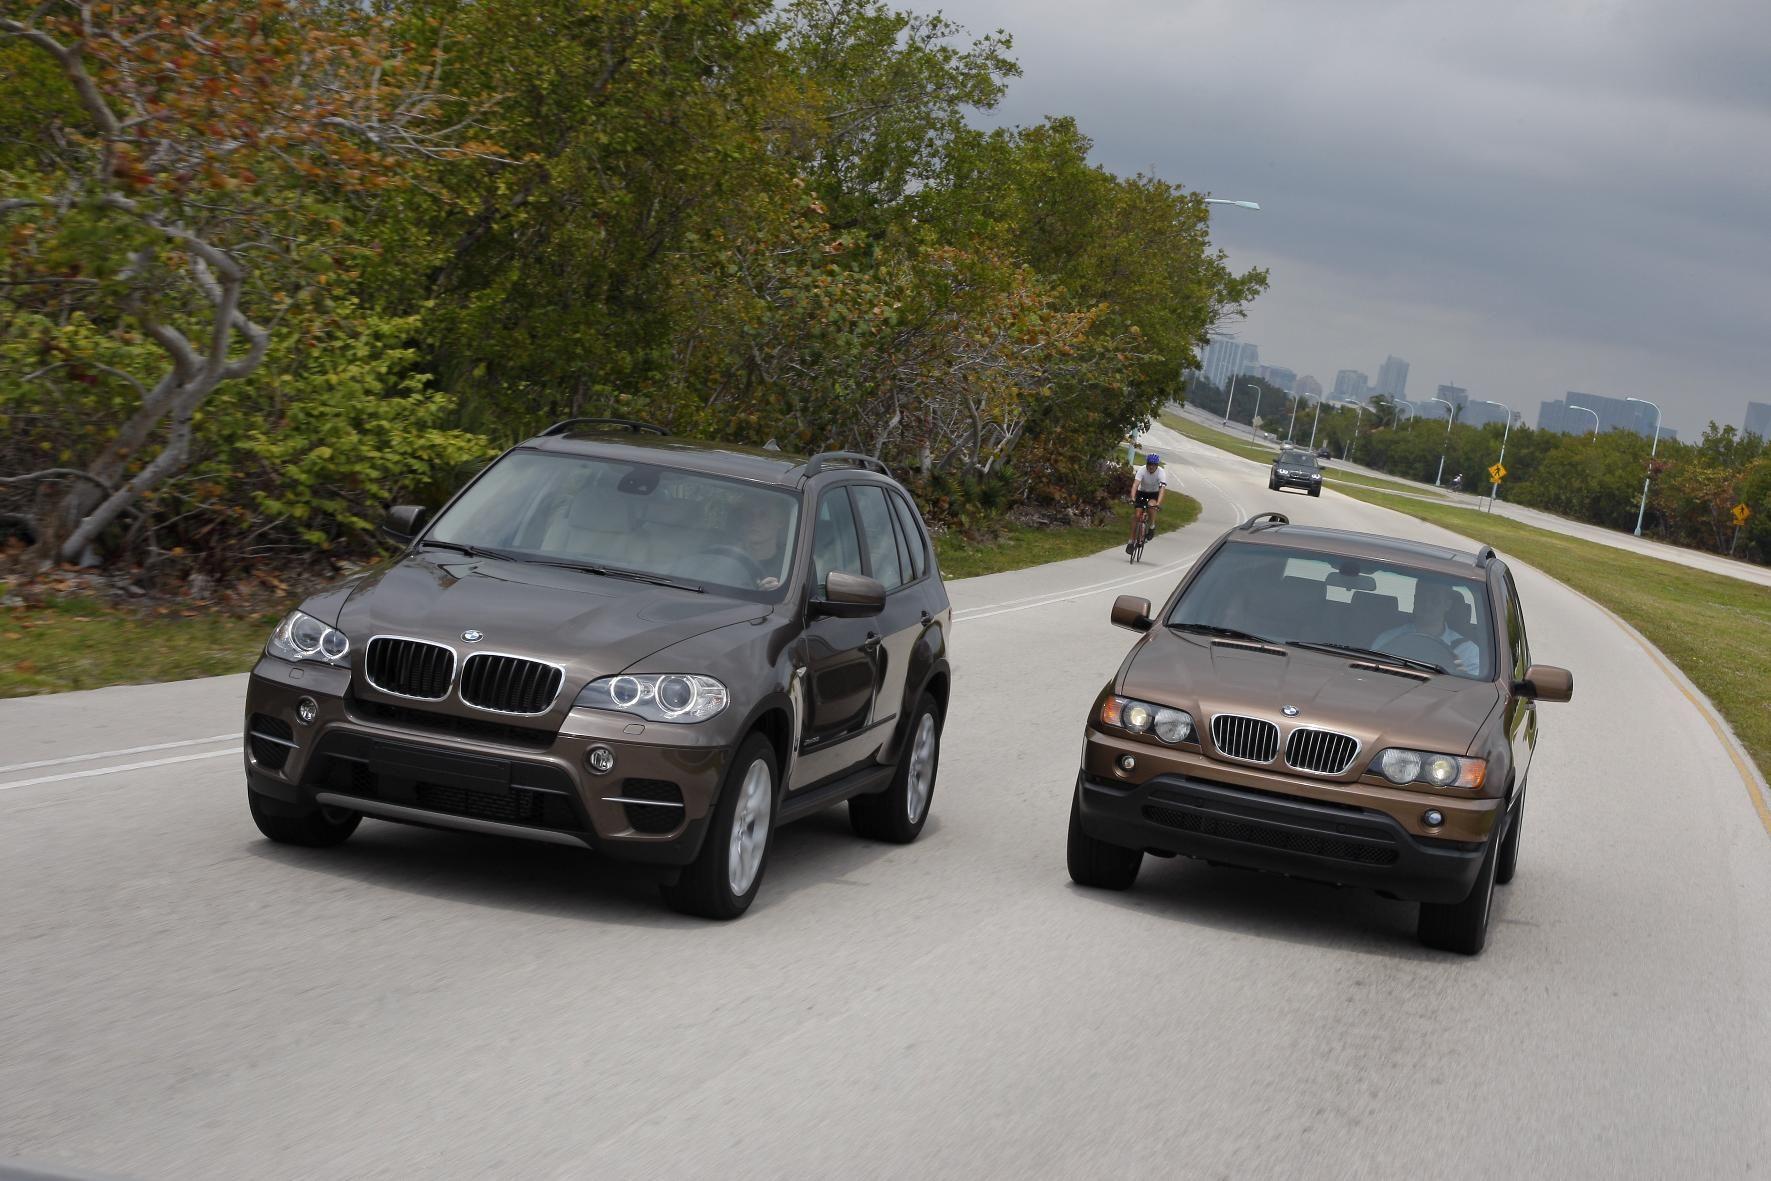 BMW-X5-E70-4.jpg